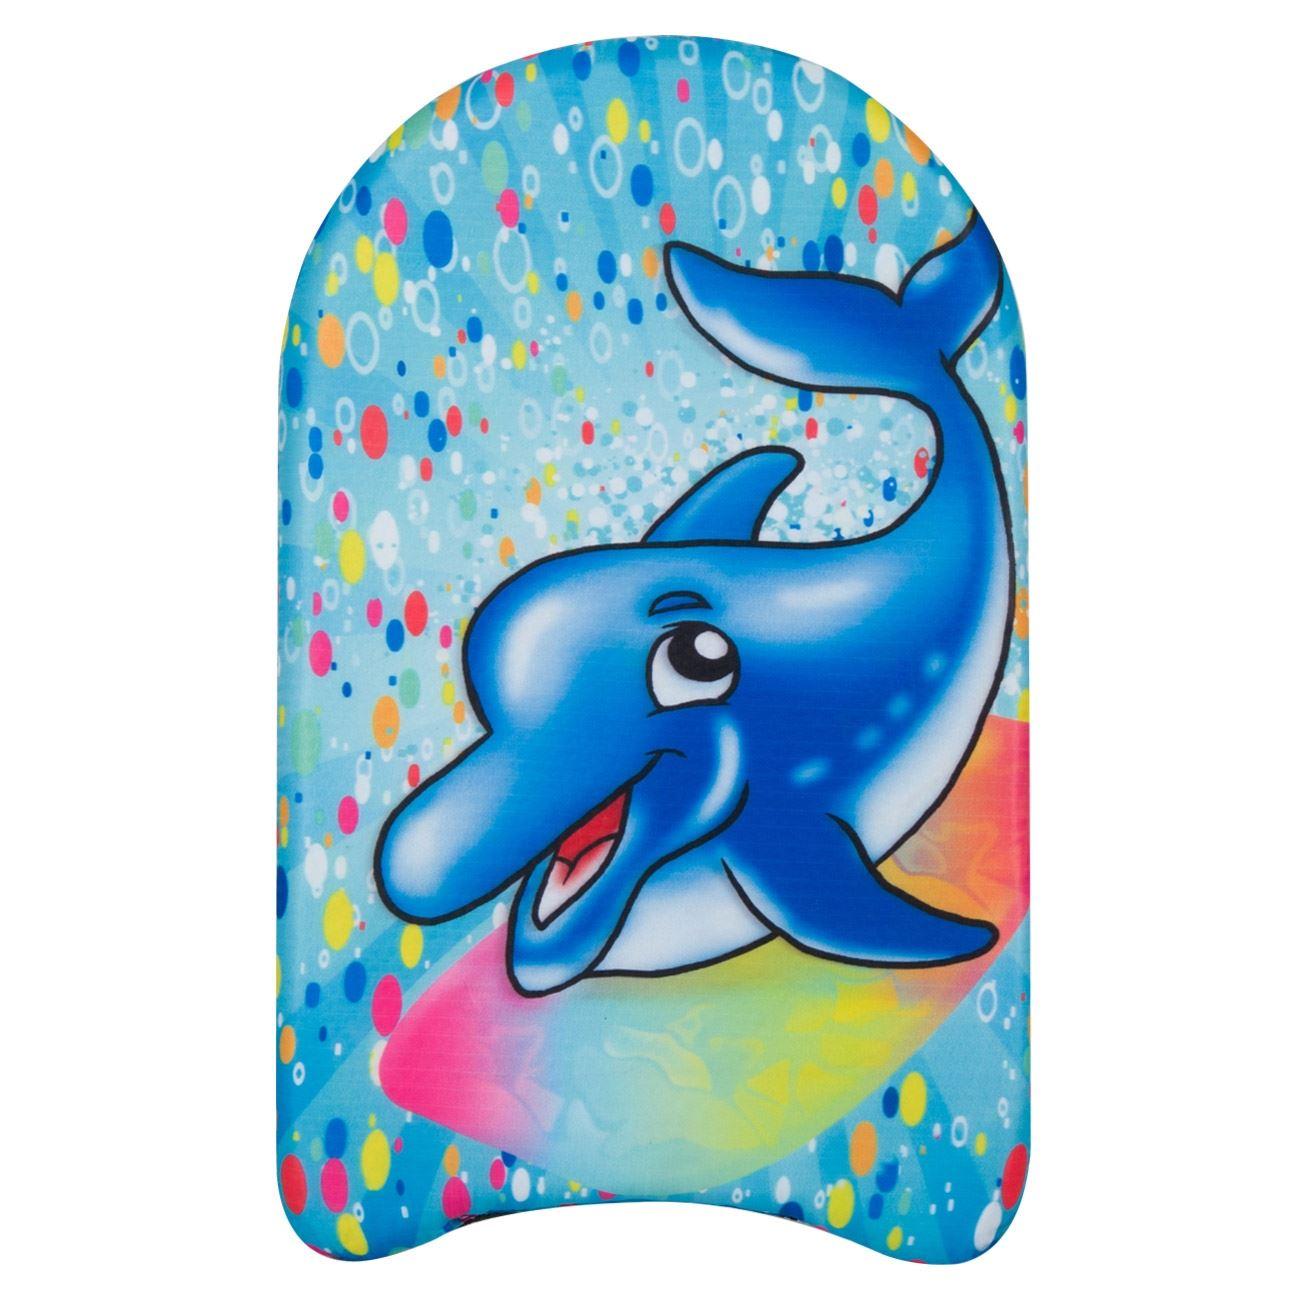 0dcfee1ce83 Σανίδα Κολύμβησης Foam Δελφίνι 42x28